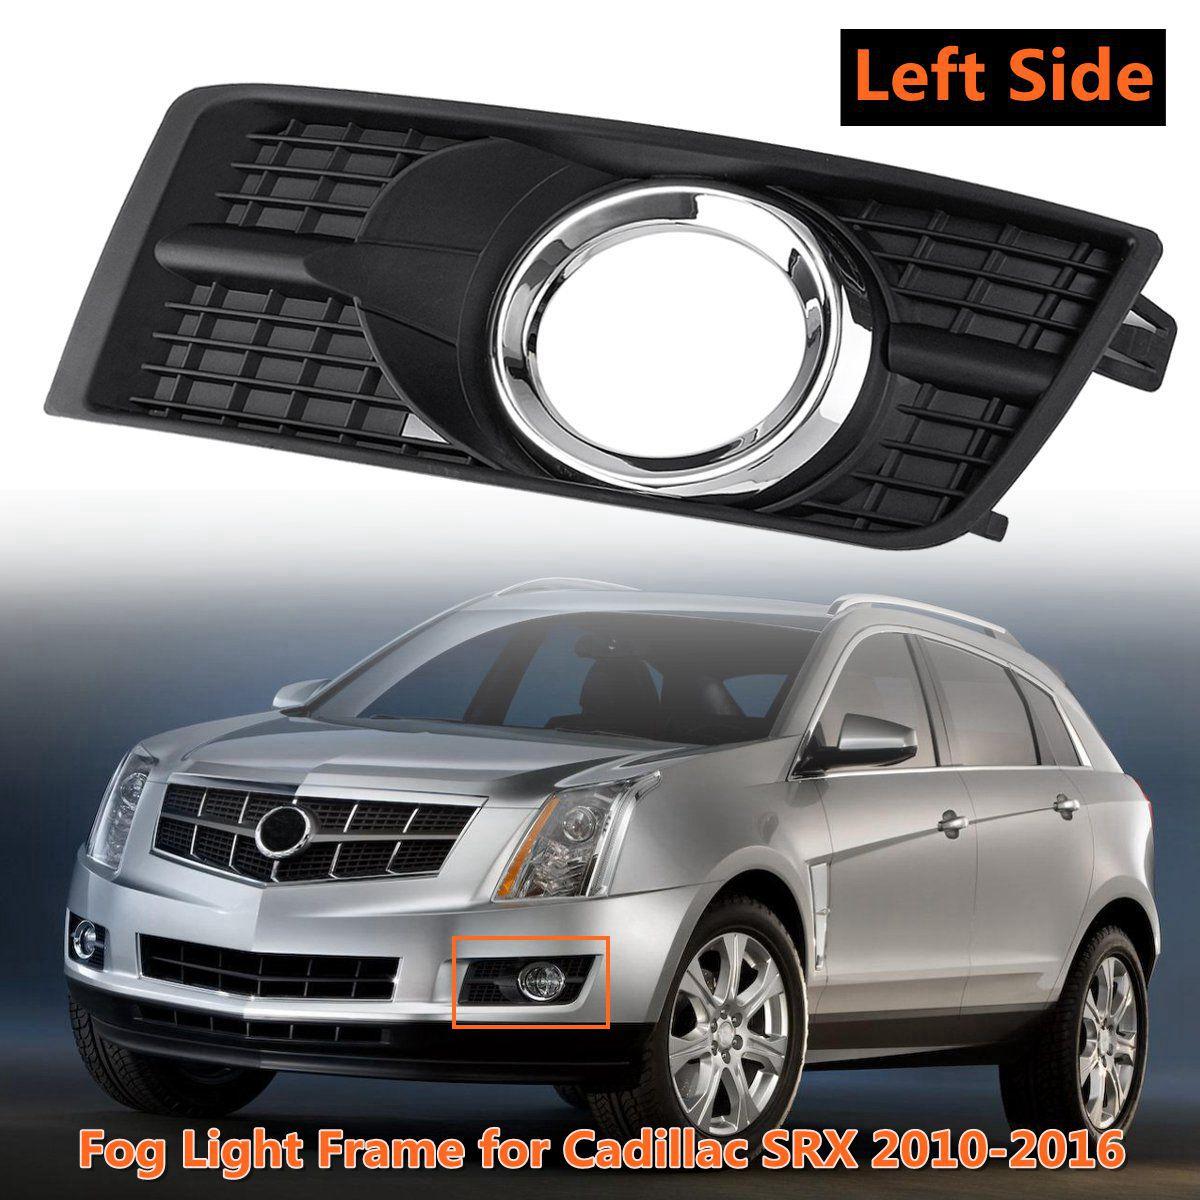 hight resolution of front bumper fog light frame grilling cover foglamp trim shell cap garnish hood for cadillac srx